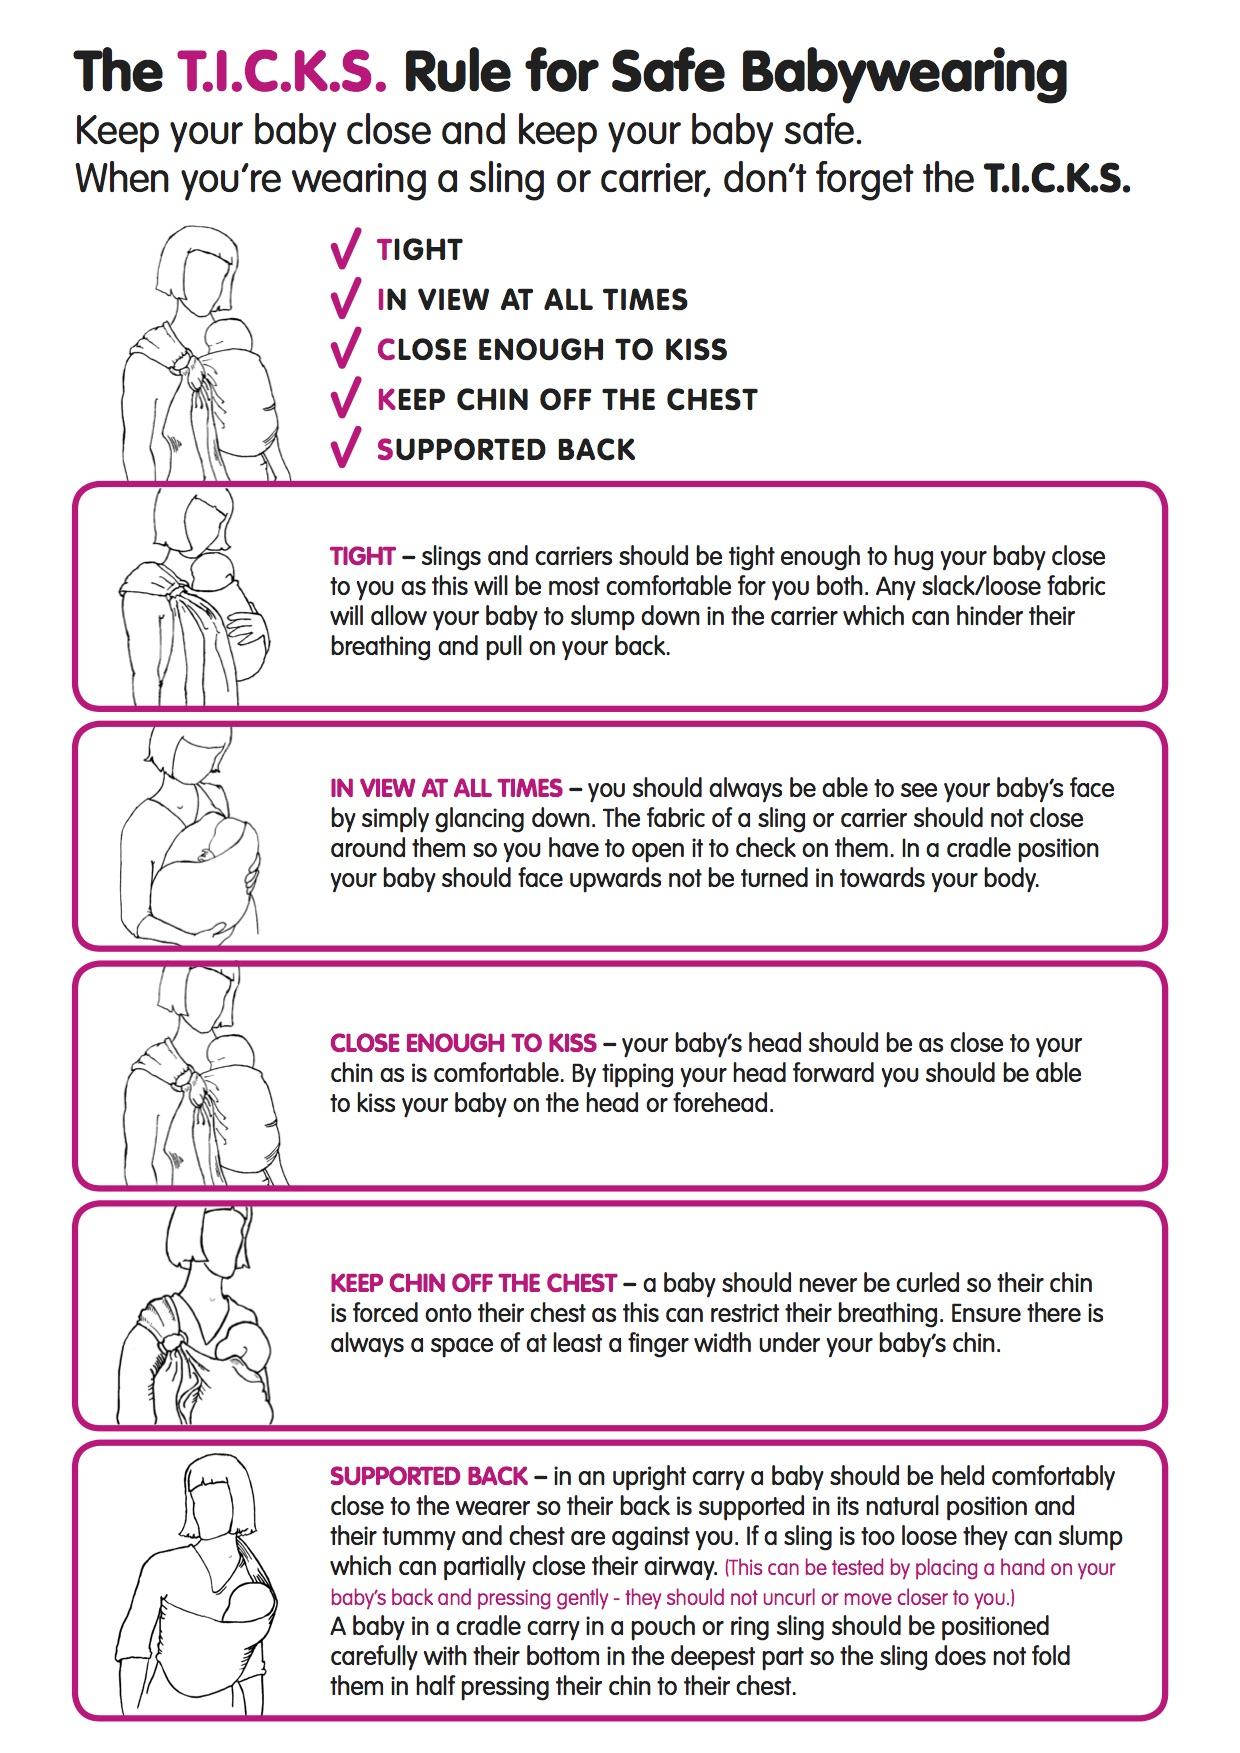 TICKS safety guidelines for babywearing.jpg